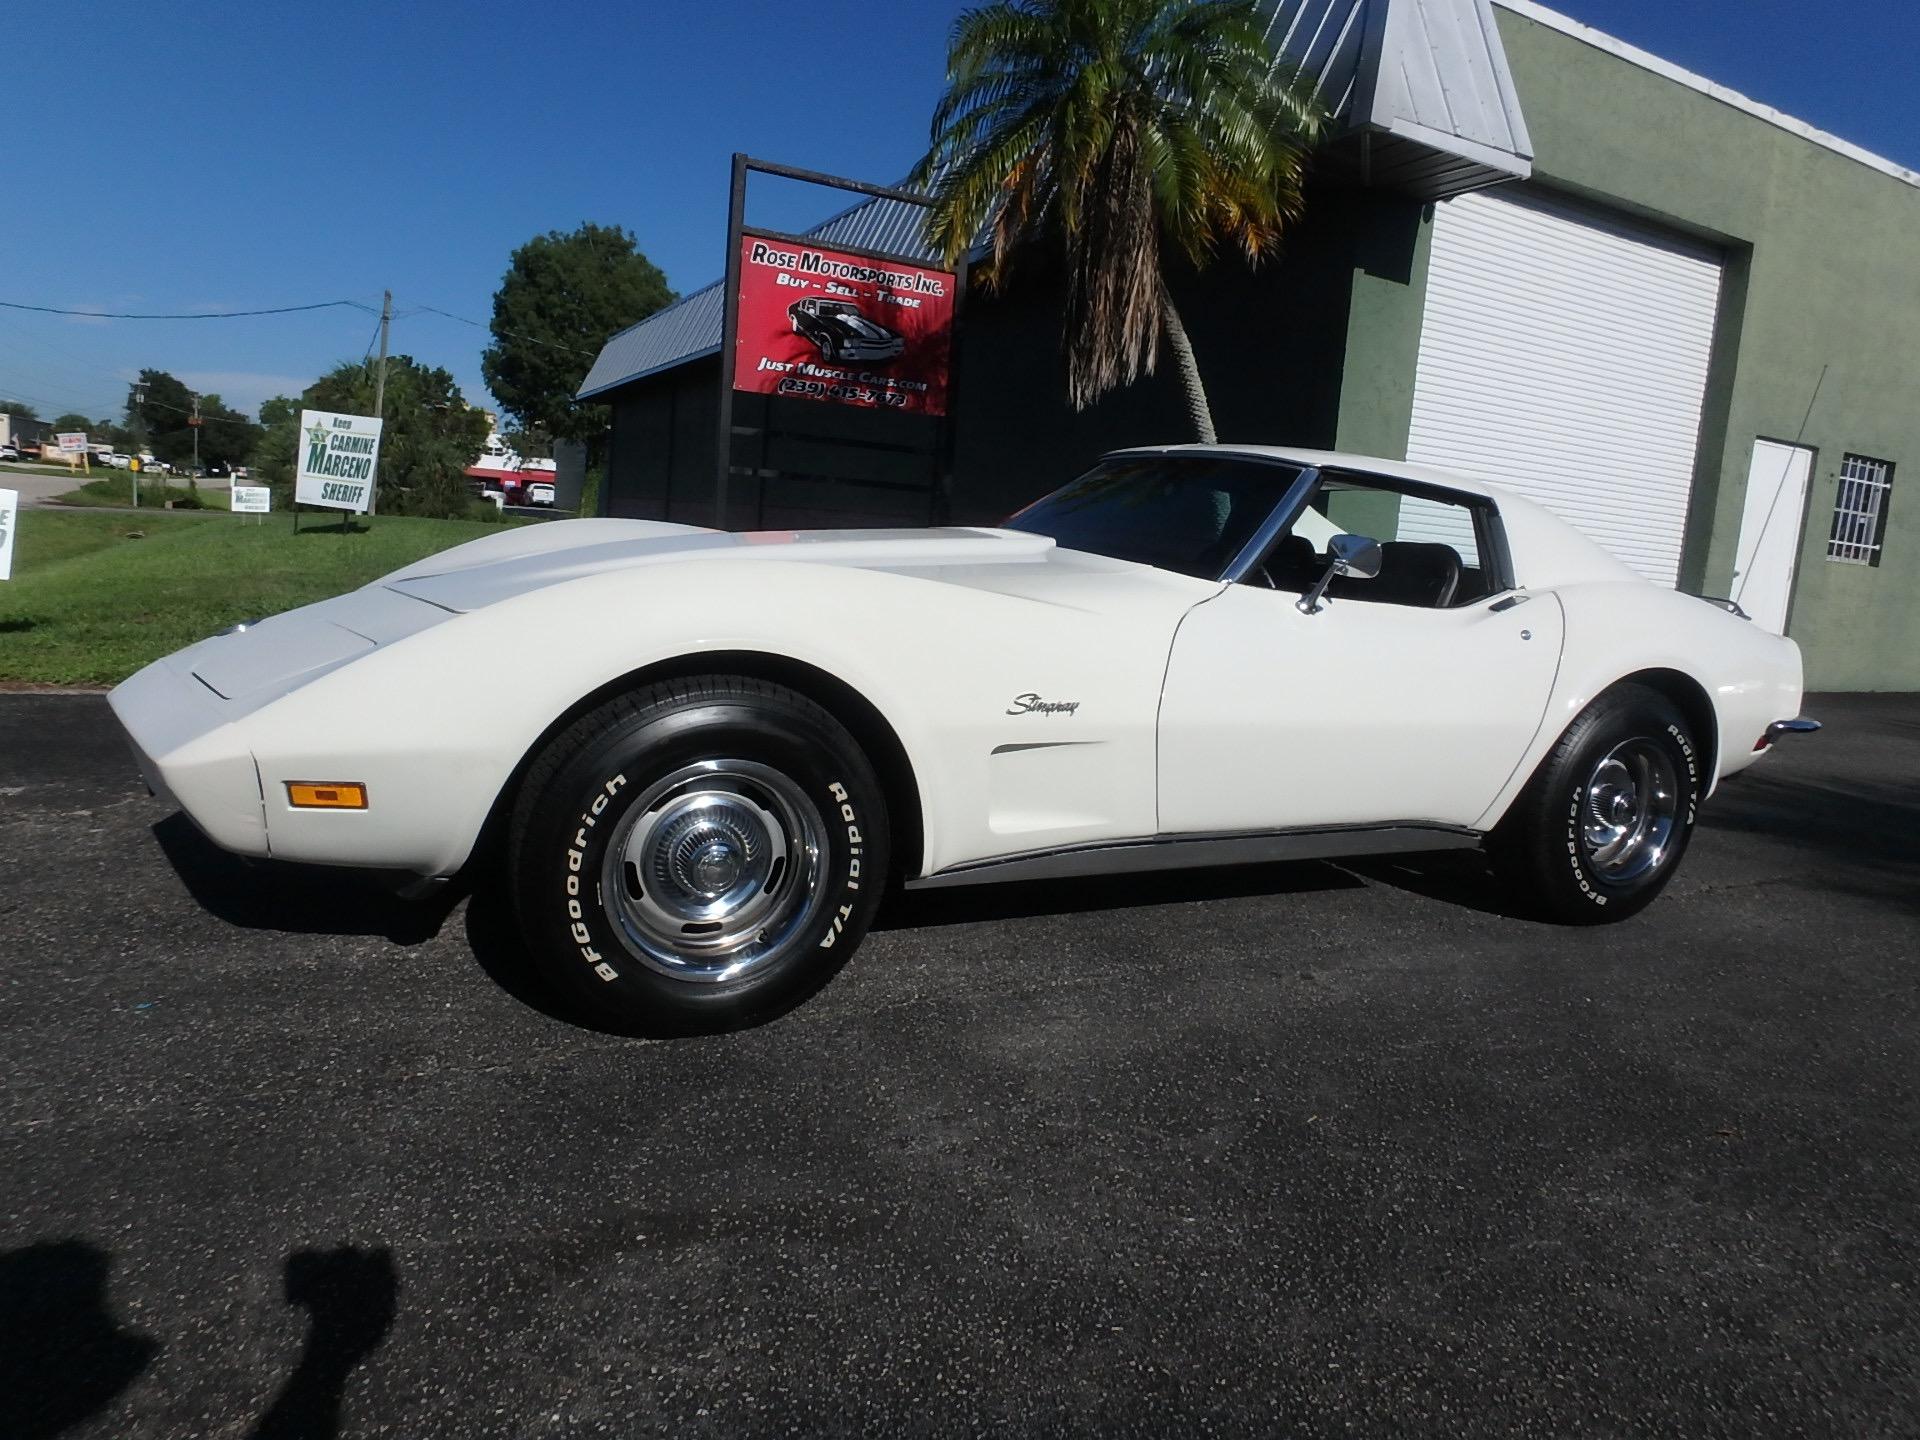 Used 1973 Chevy Corvette Stingray